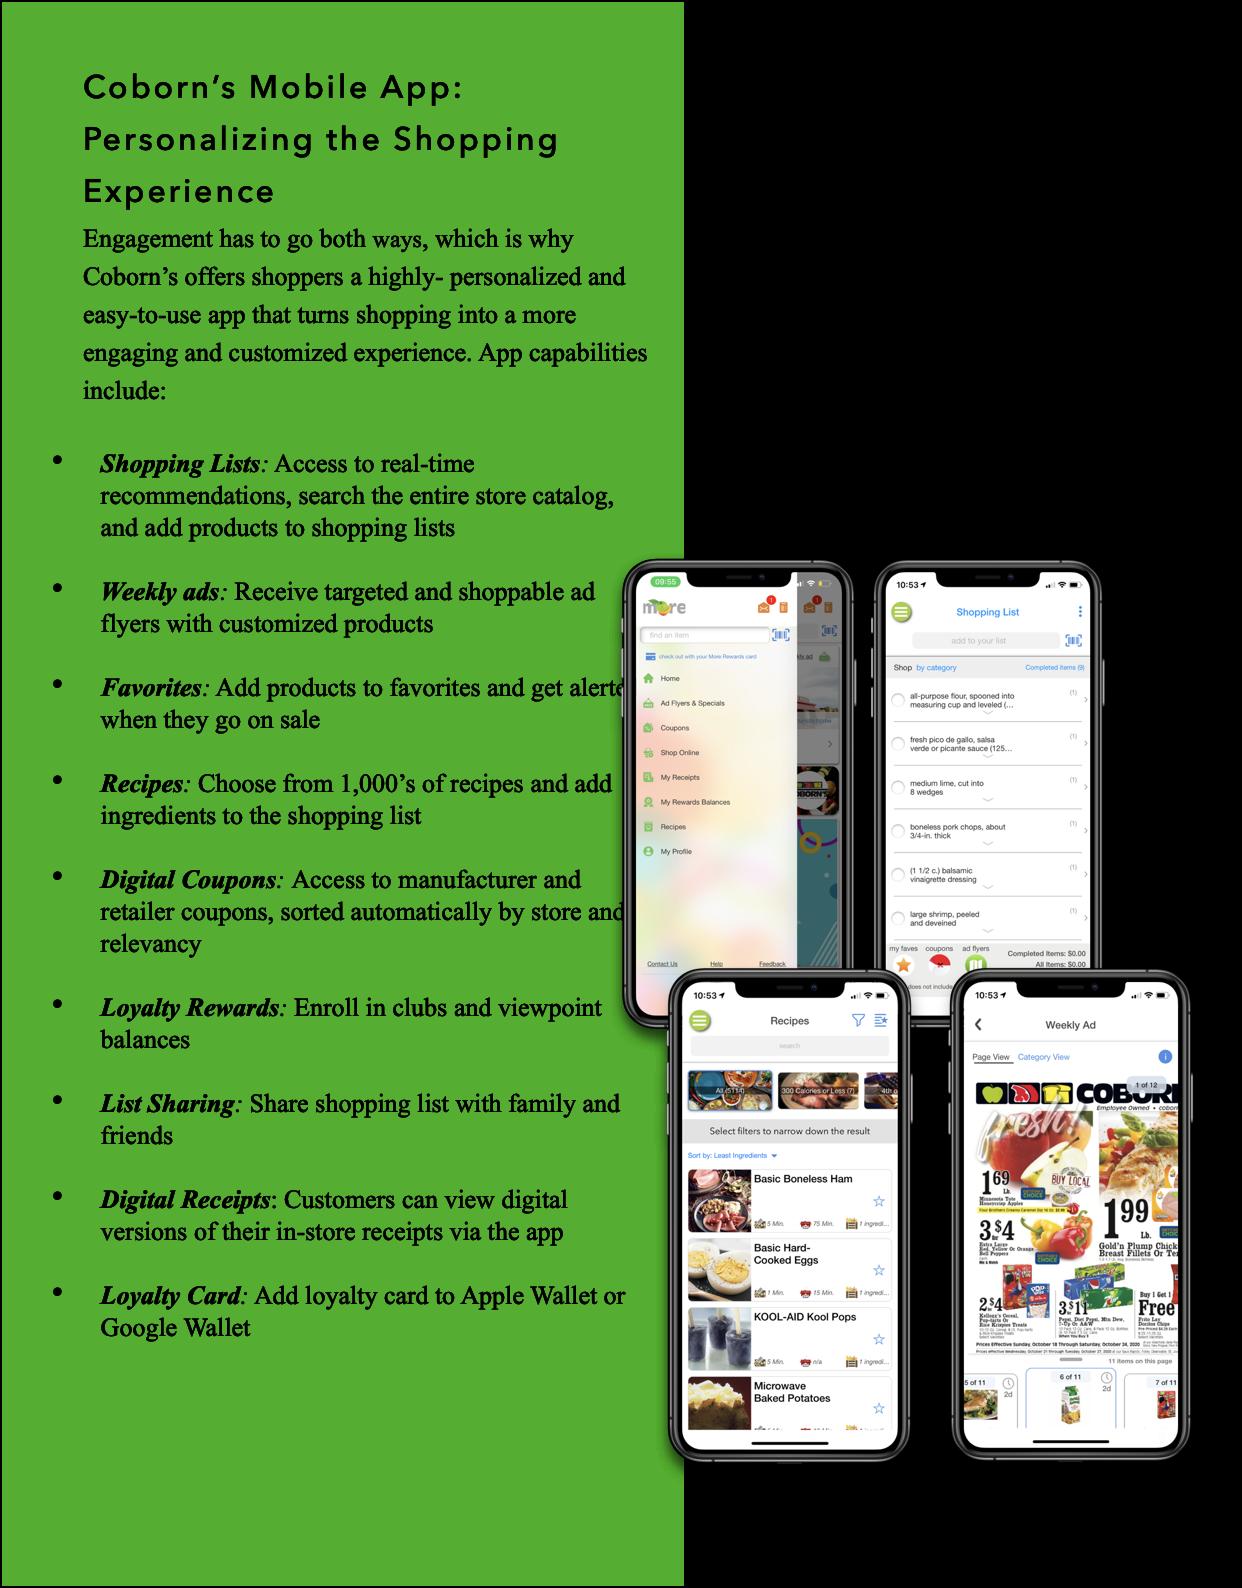 Coborn's mobile app